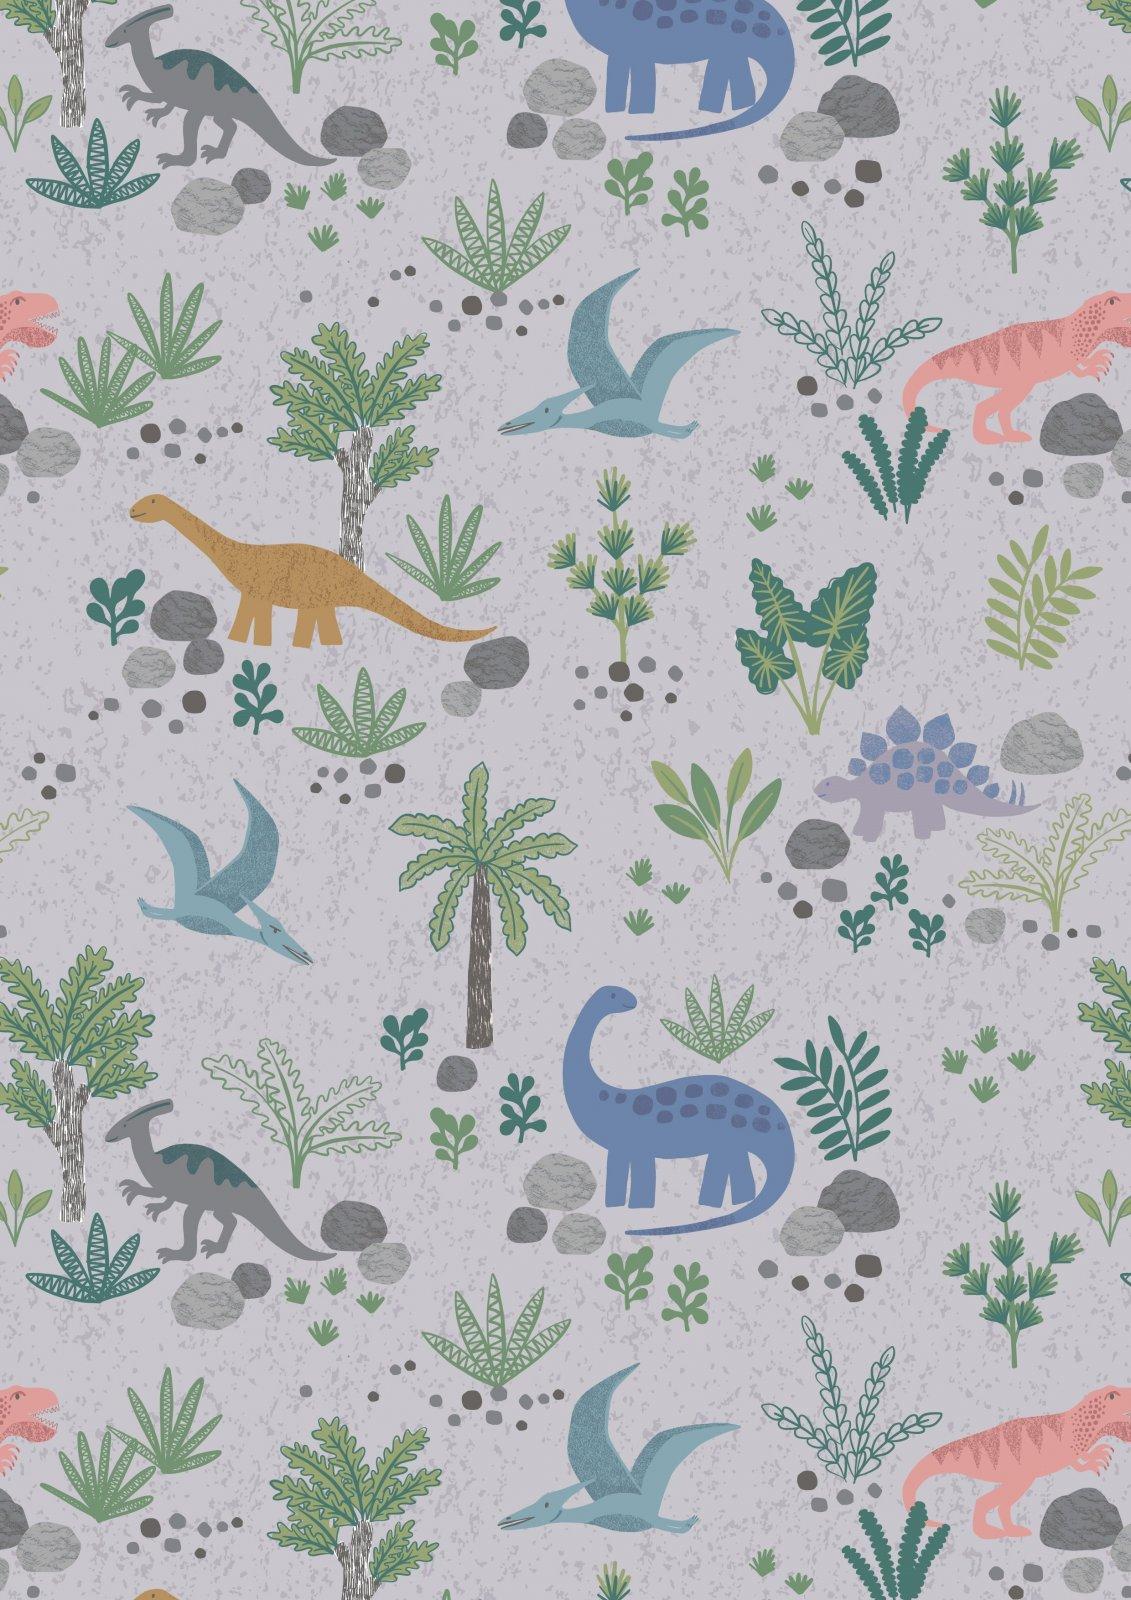 Kimmeridge Bay Land Dinos on grey